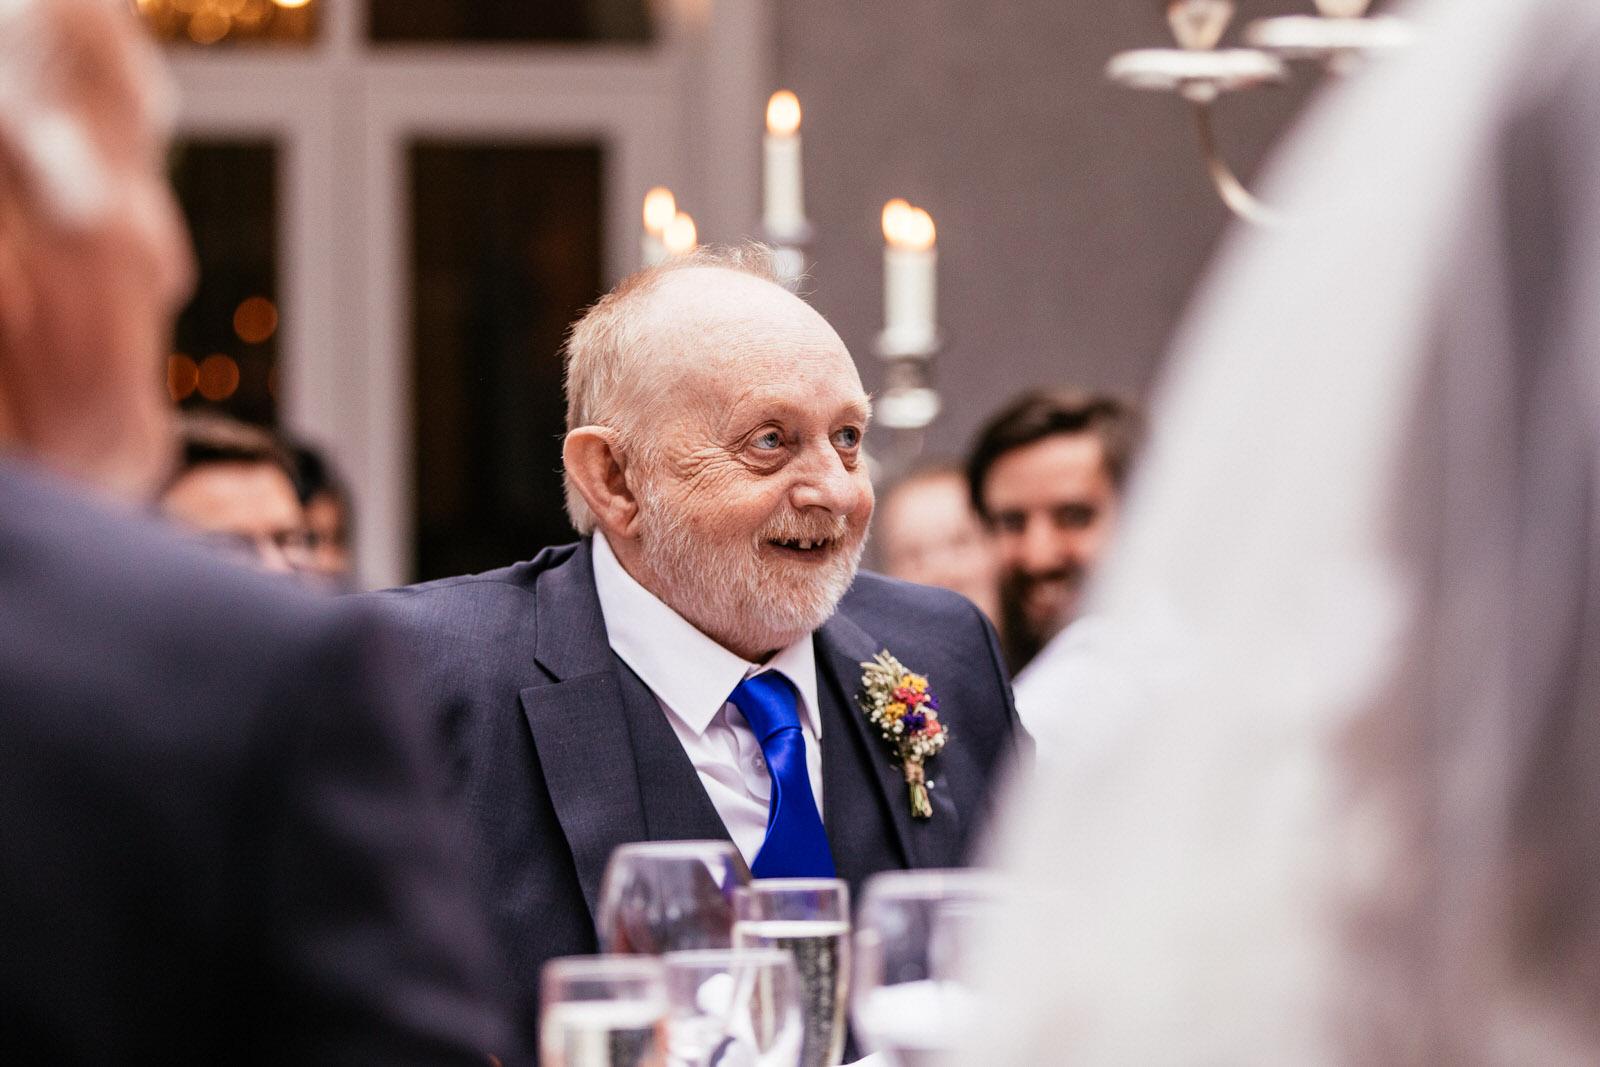 Carmel-and-Dan-Wedding-Highlights-59.jpg